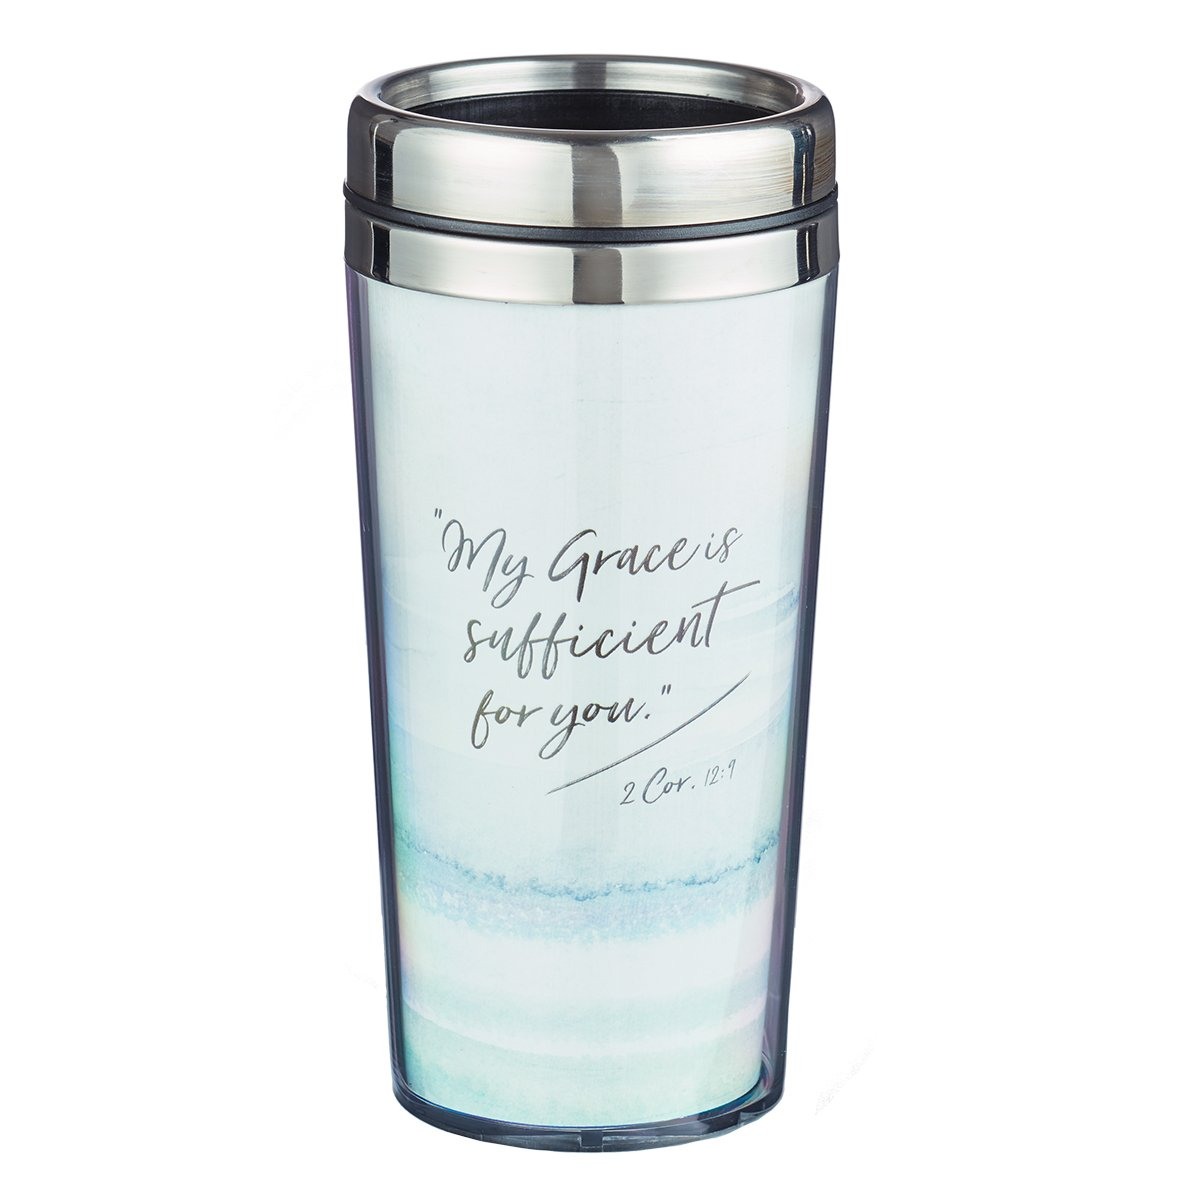 Coffee Travel Mug: My Grace Is Sufficient - 2 Corinthians 12:9